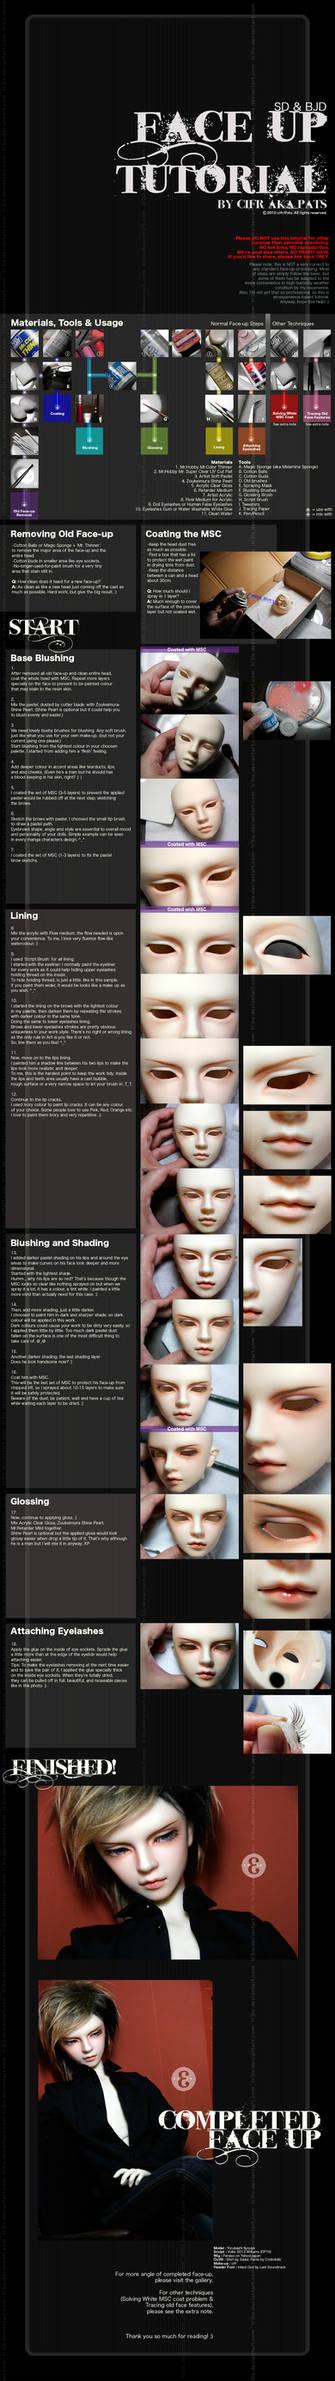 Face-up : TUTORIAL